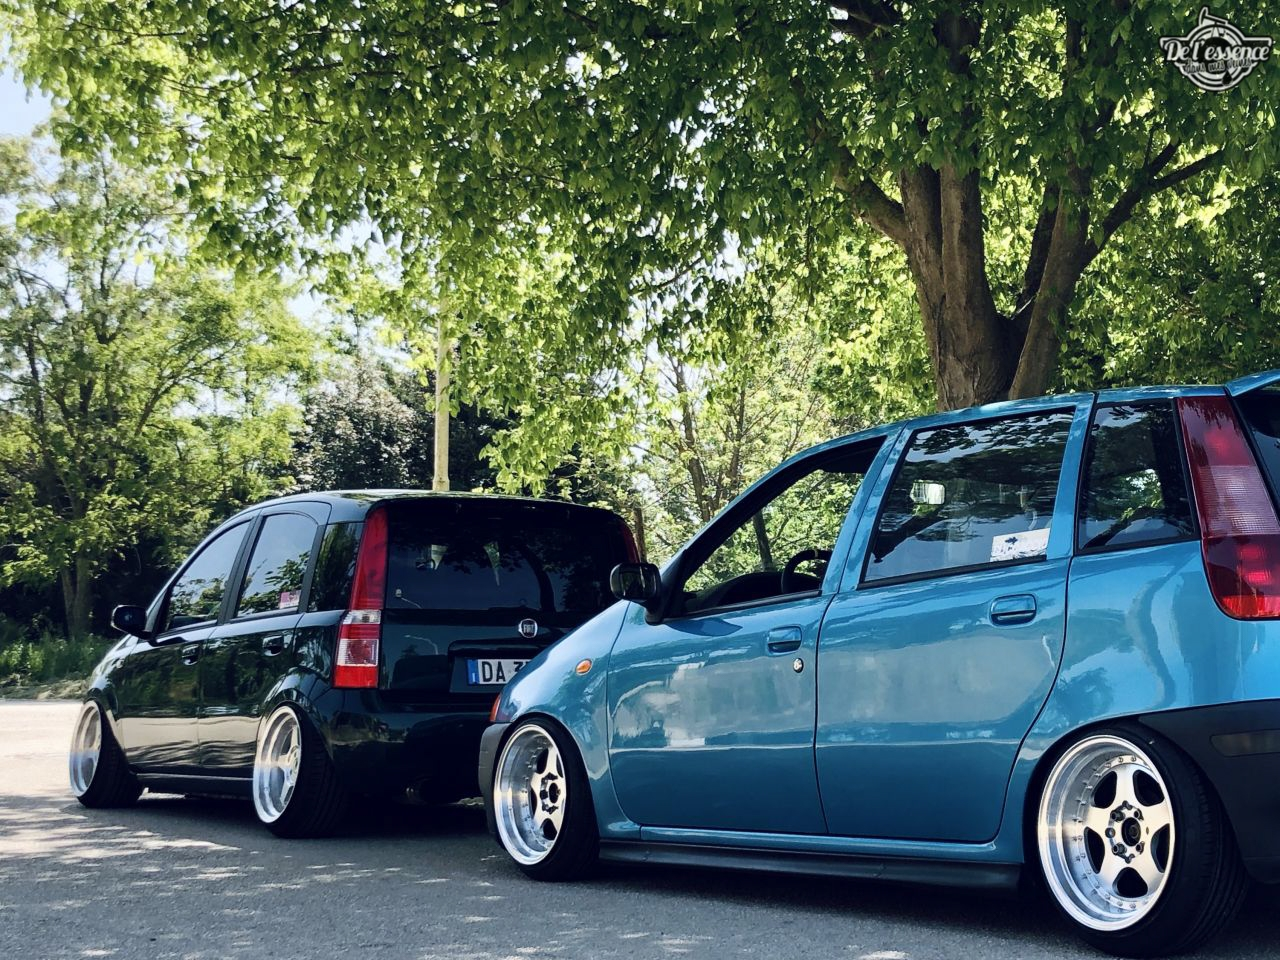 #StanceDiscount - Buccacio Gang#3 : Fiat Punto I 21